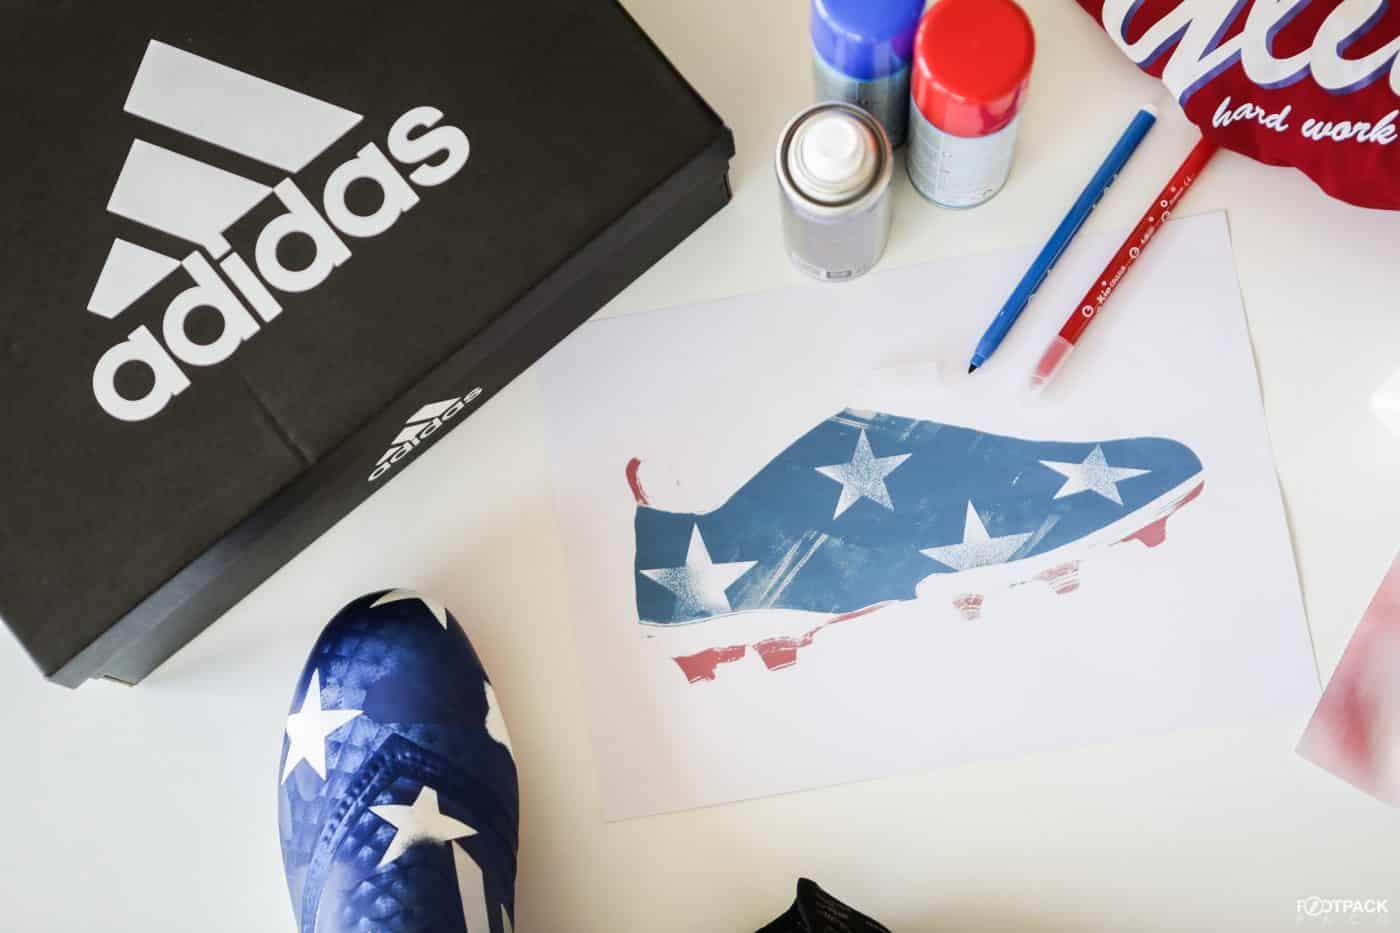 adidas-glitch-skin-worldskin-equipe-de-france-etoiles-11